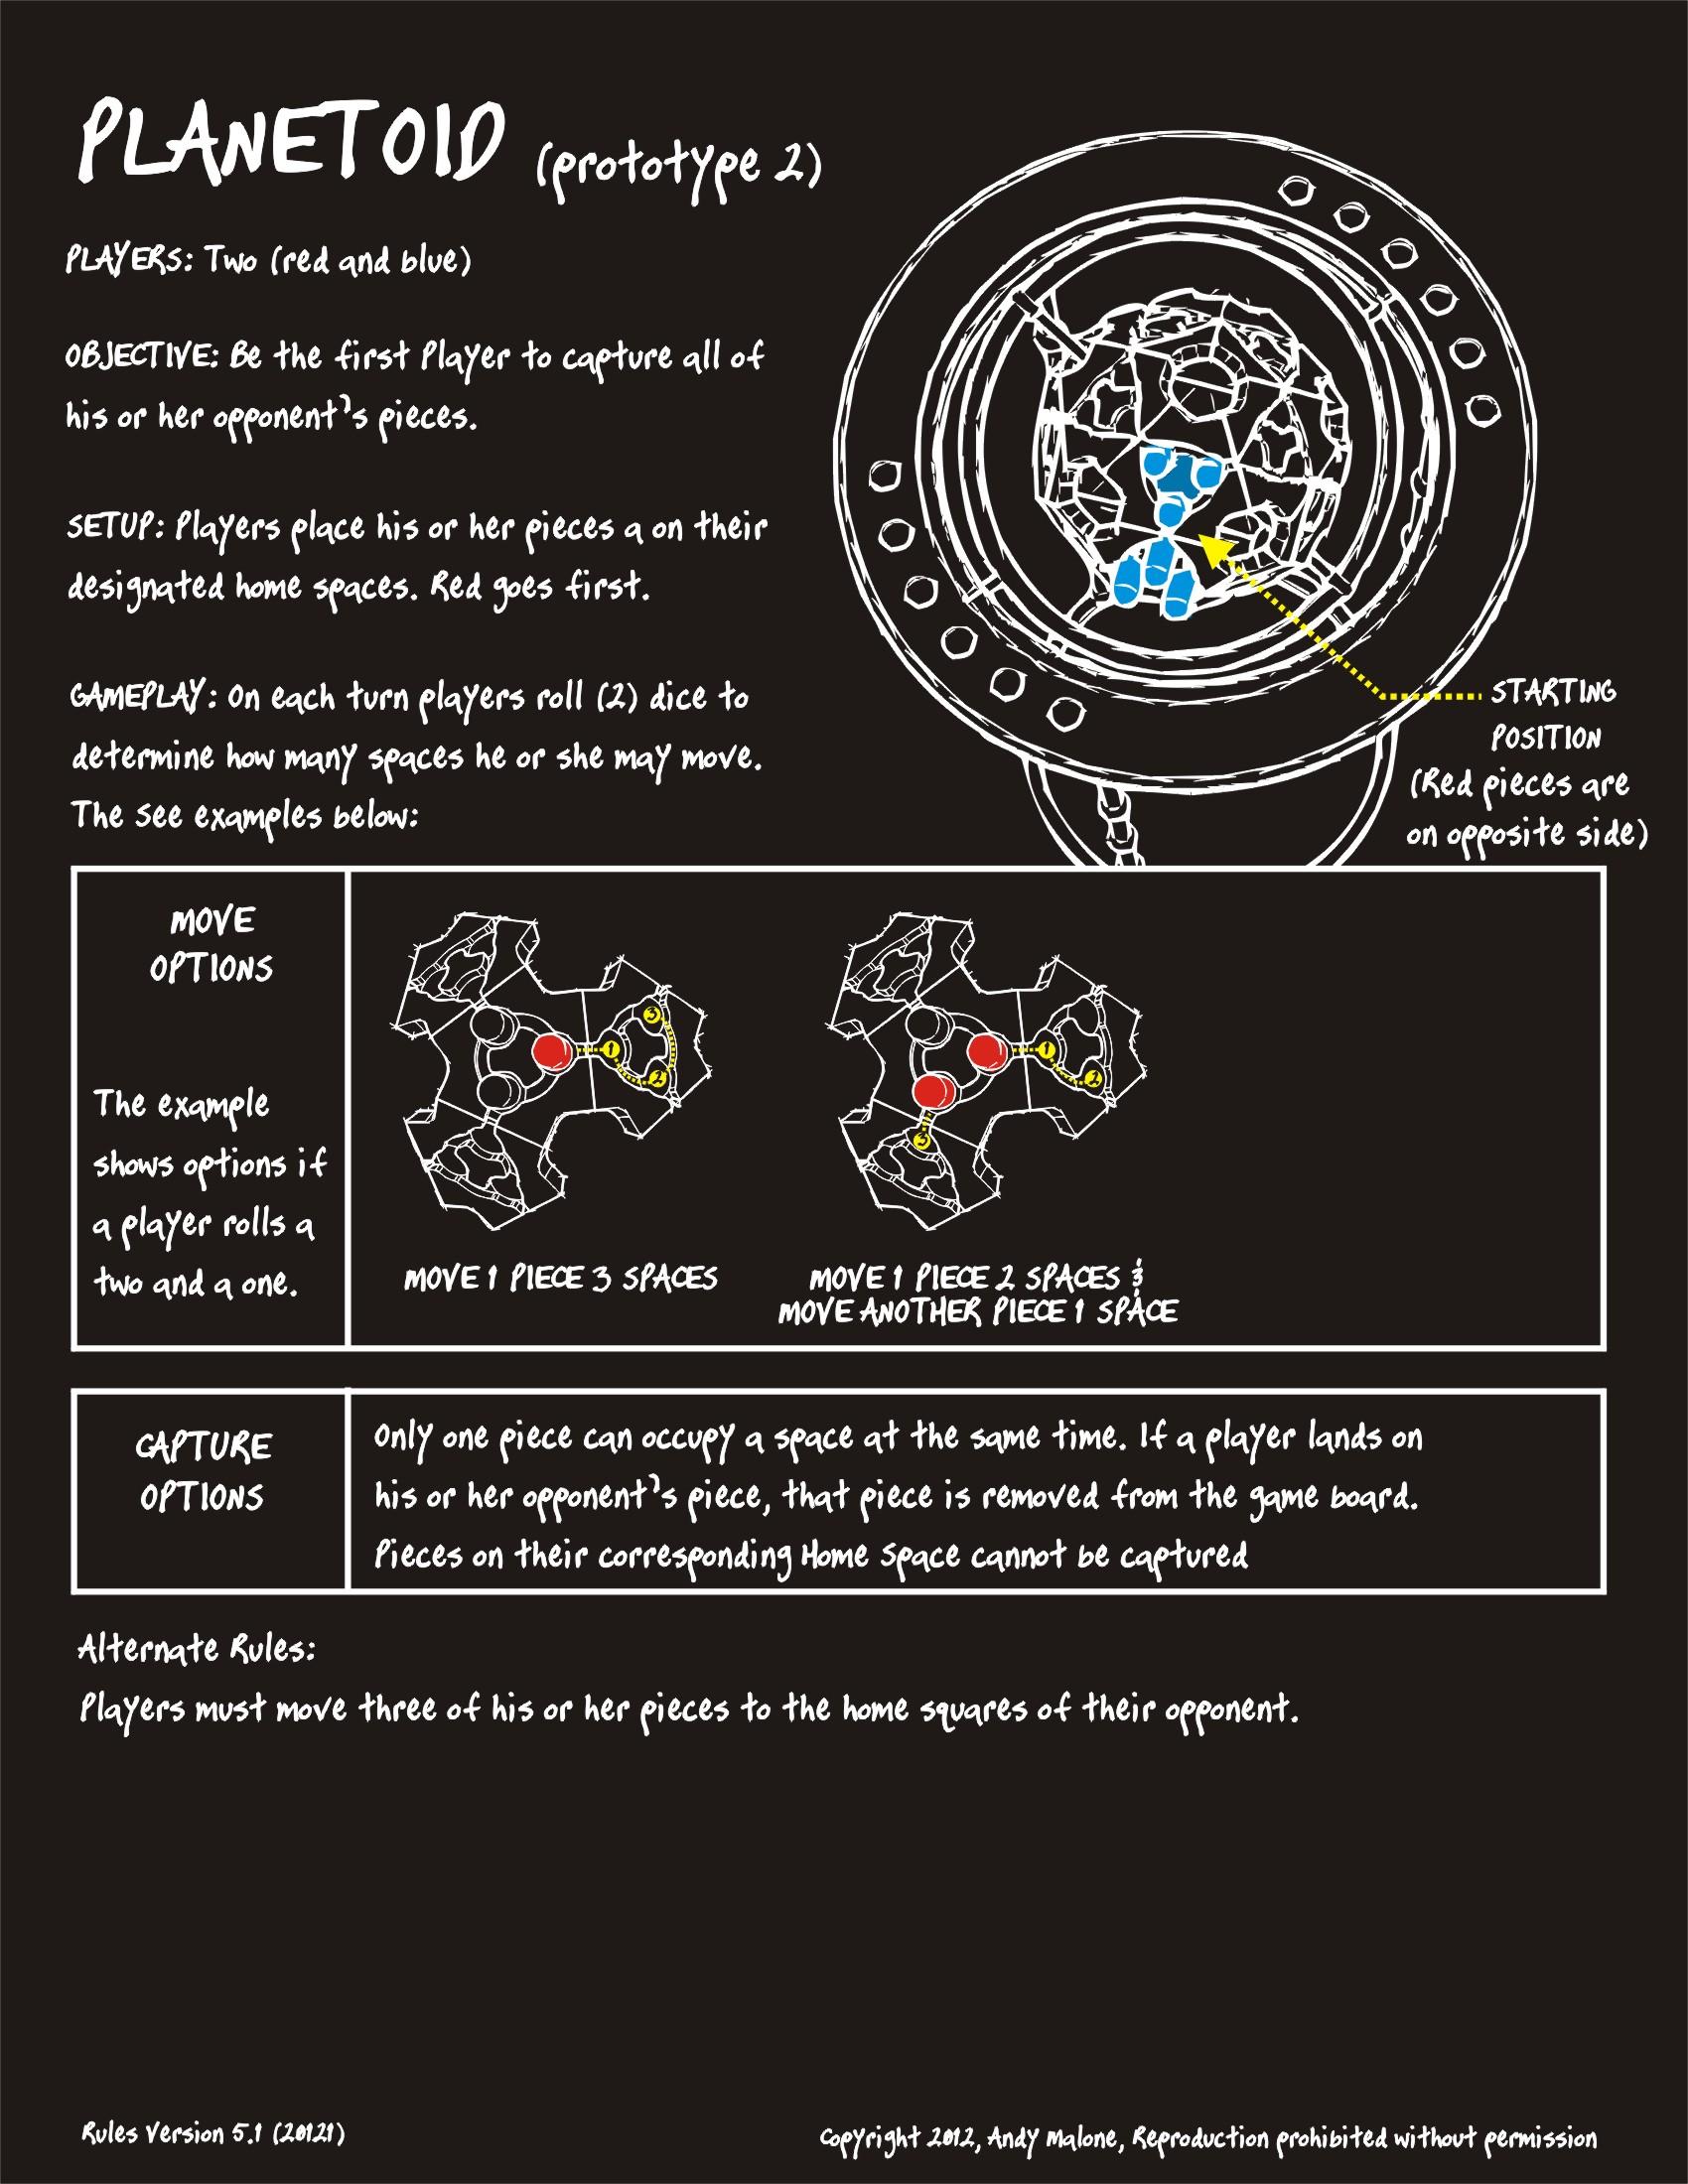 Planetoid RULES_05 07-05-2012.JPG